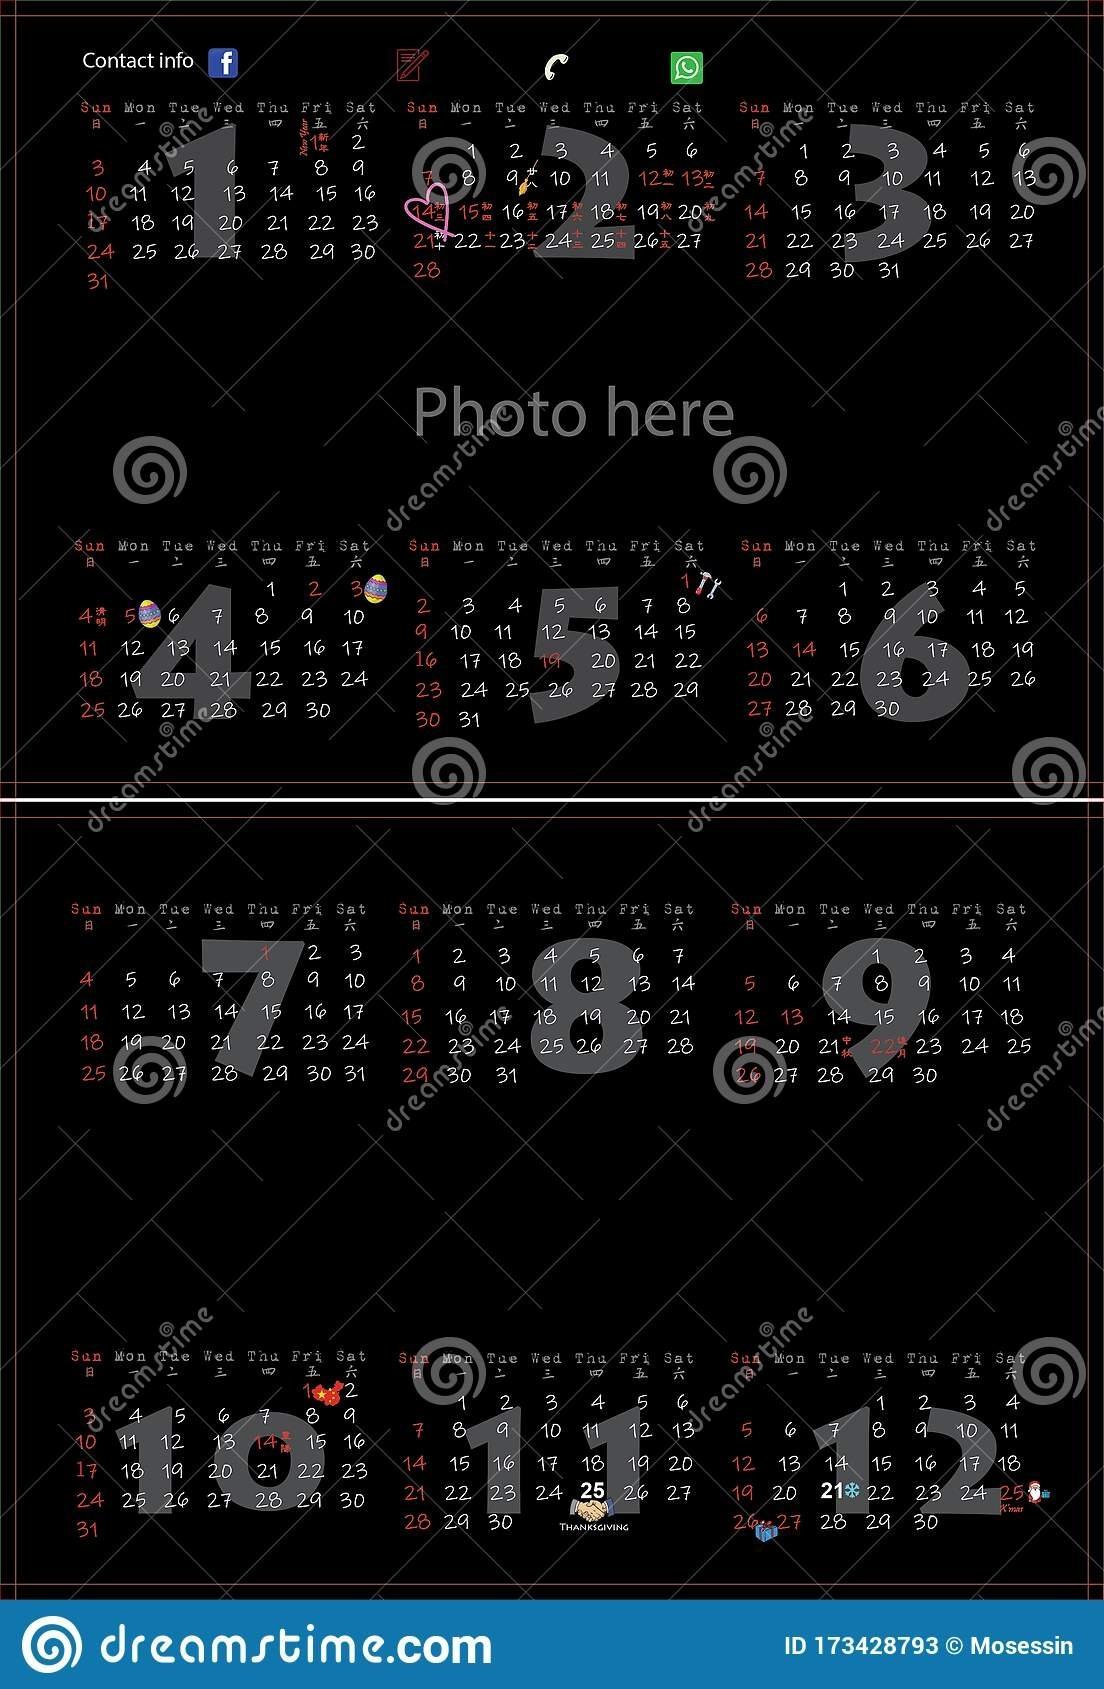 2021 Hk Calendar Template Stock Vector. Illustration Of 2021 Calendar Hk